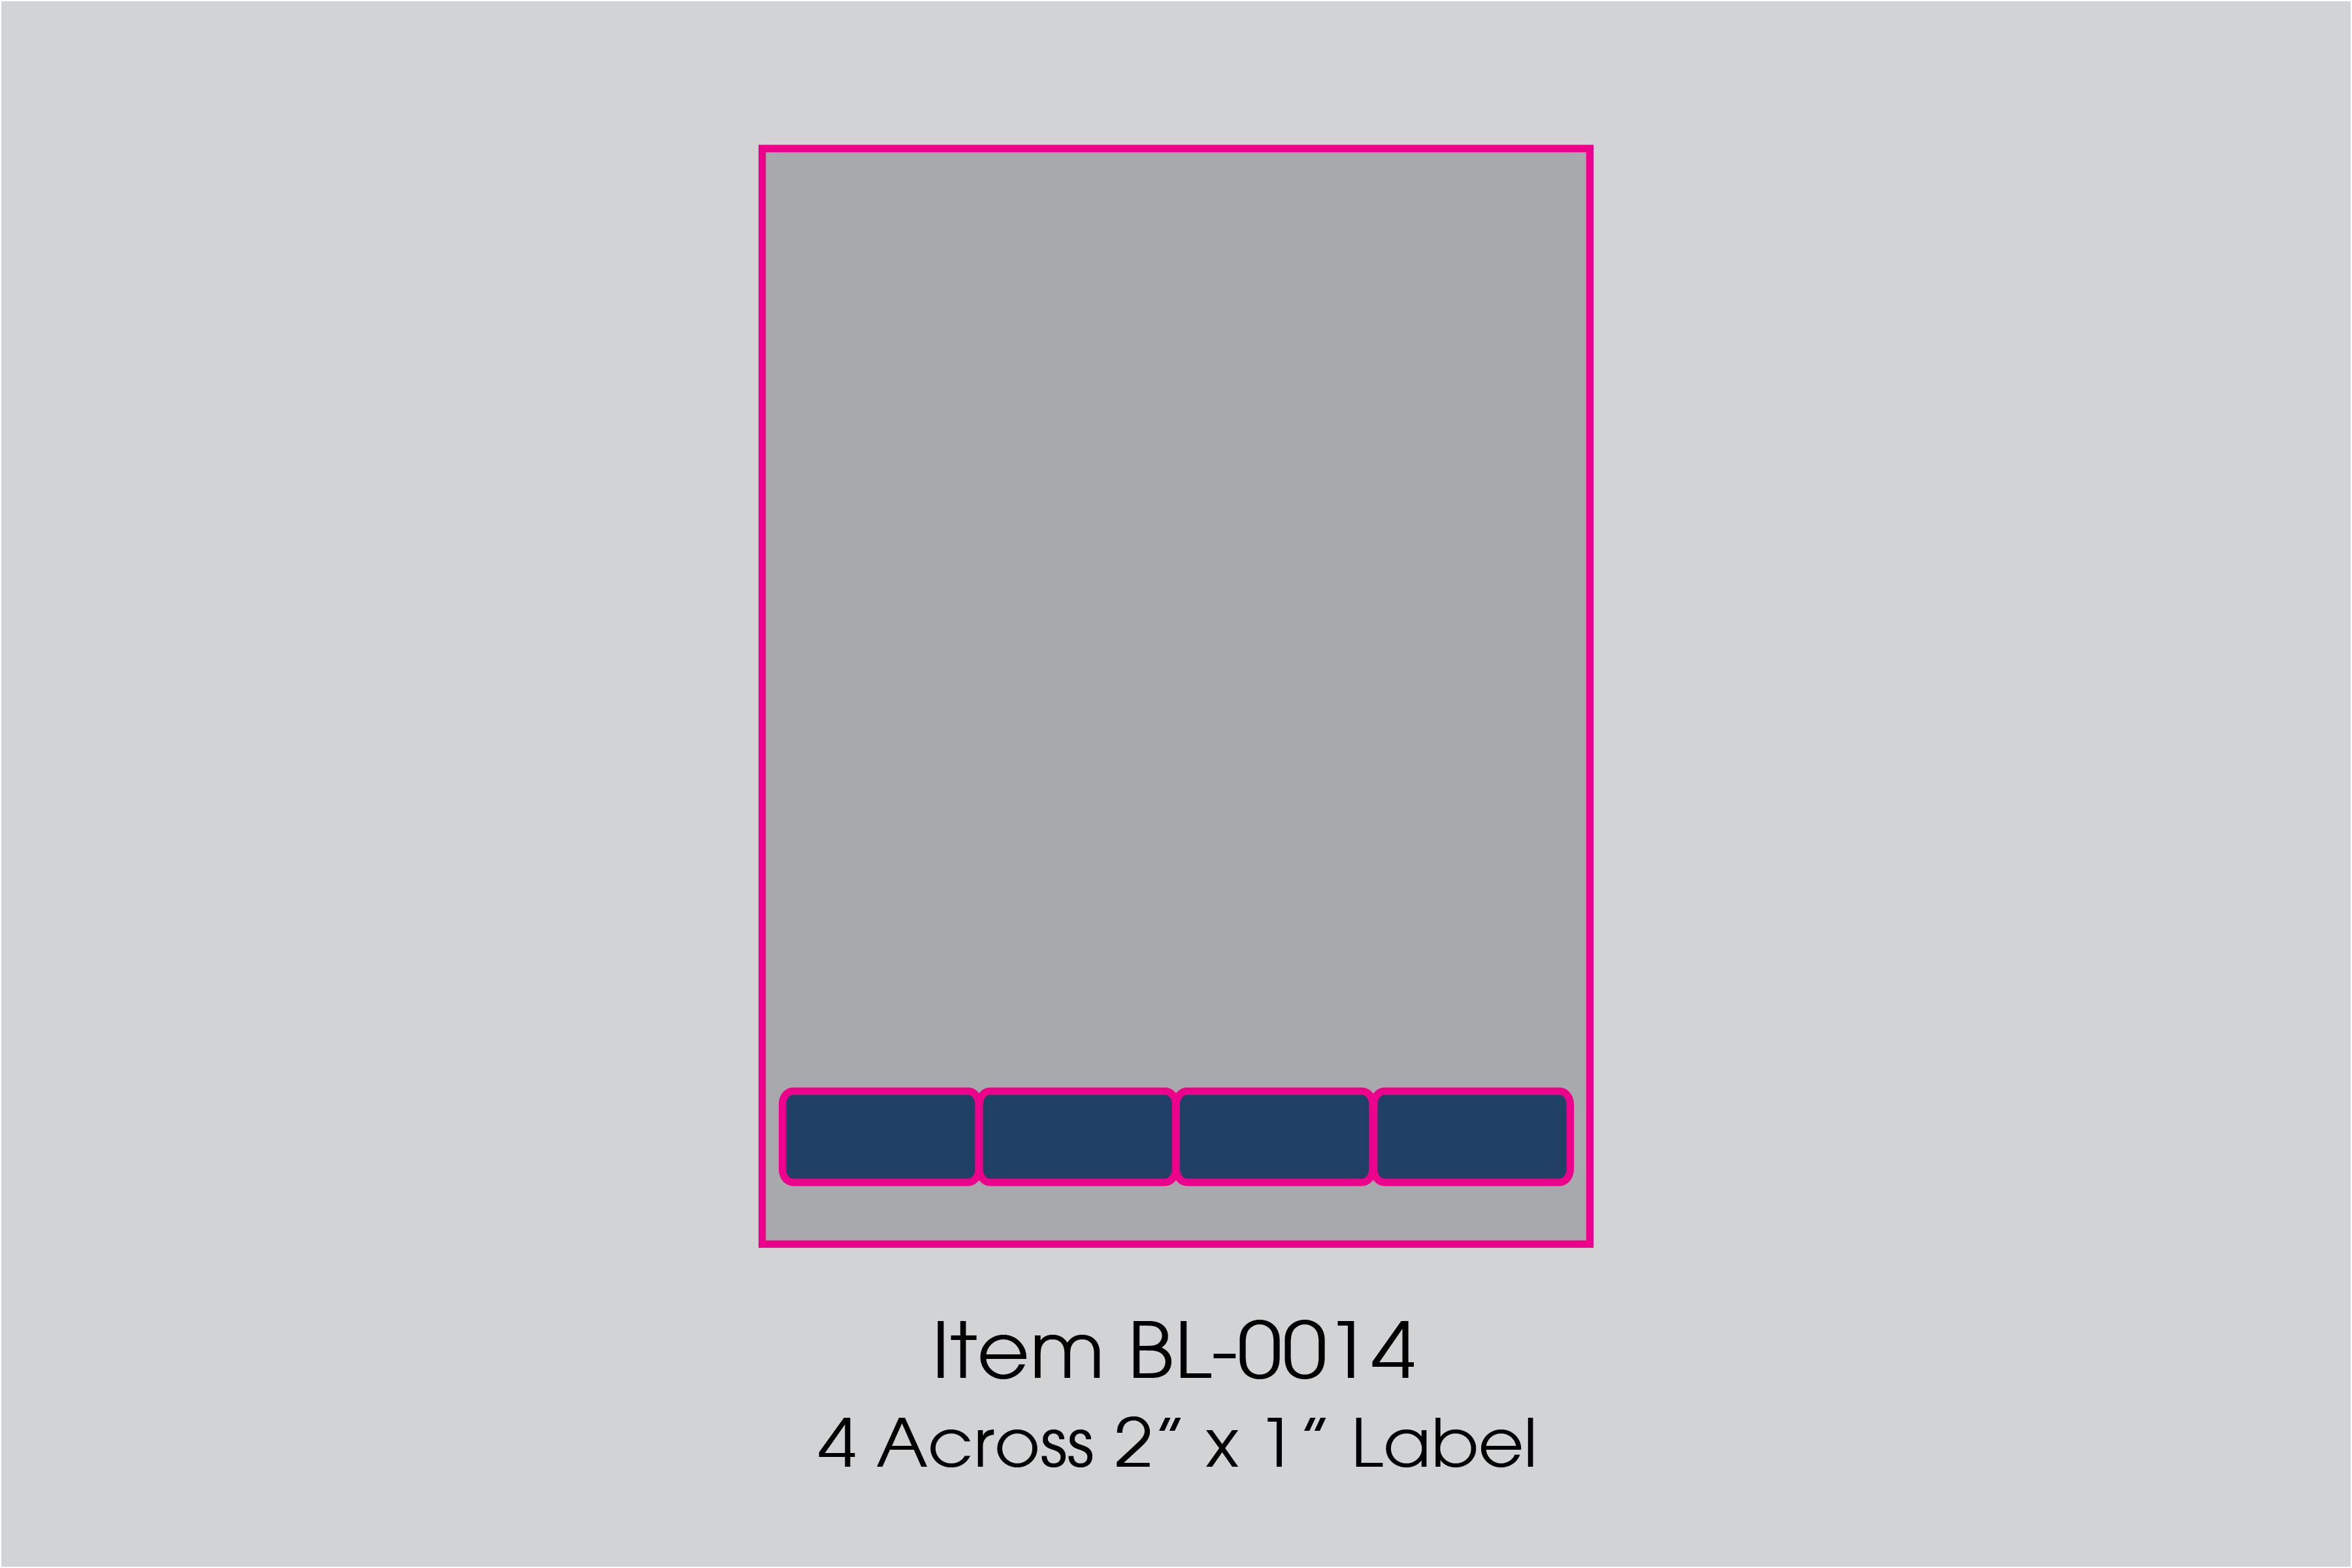 BL-0014